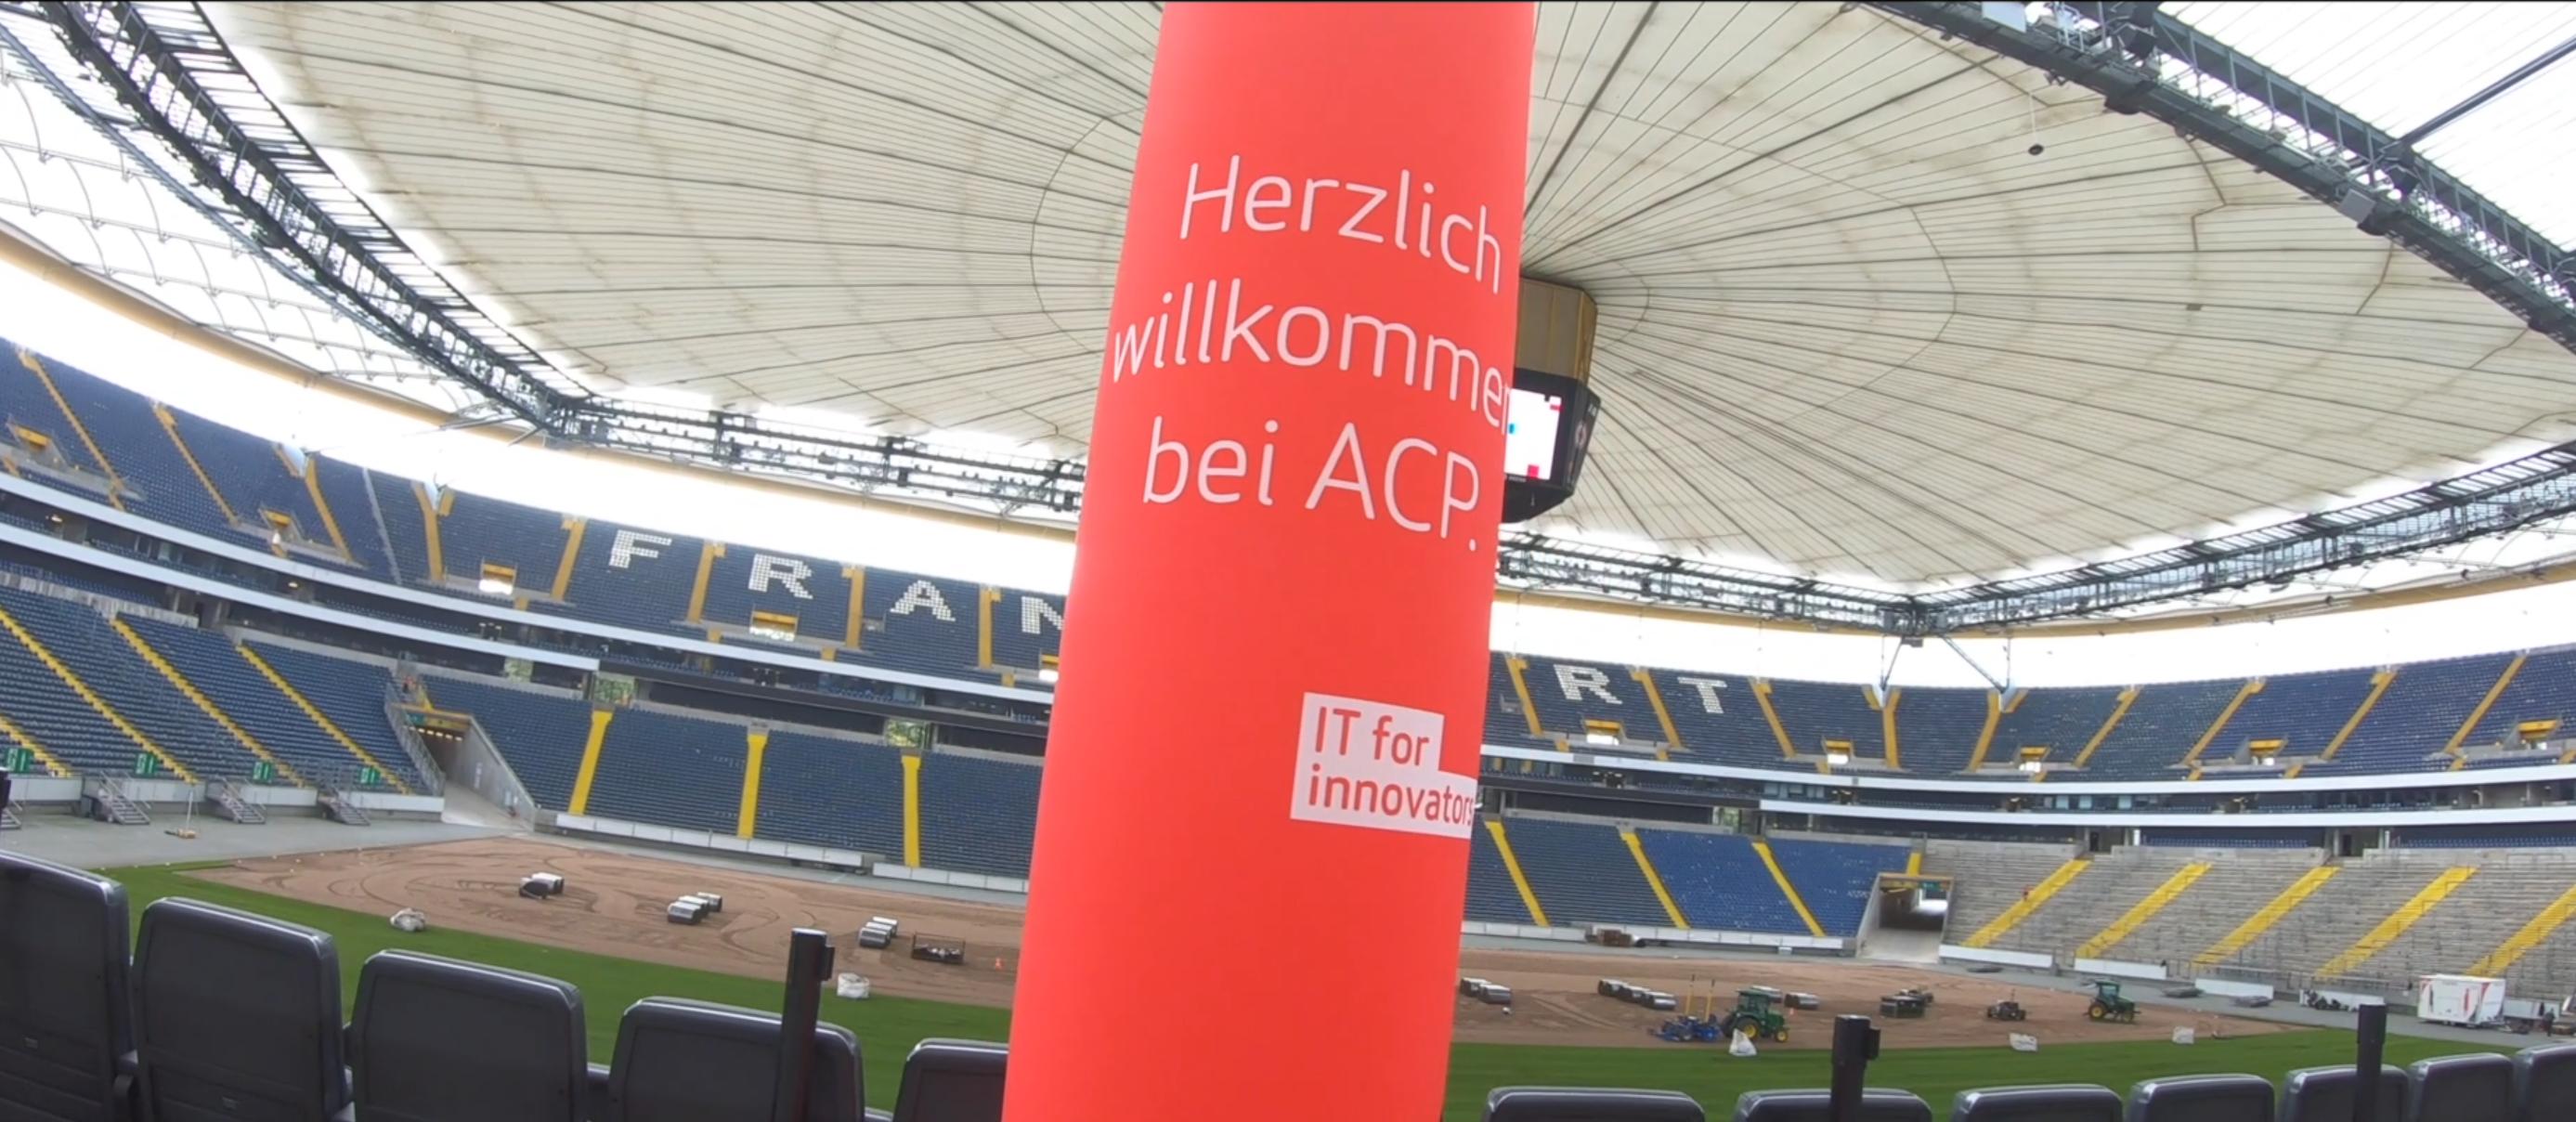 ACP IT Conference Frankfurt 2019